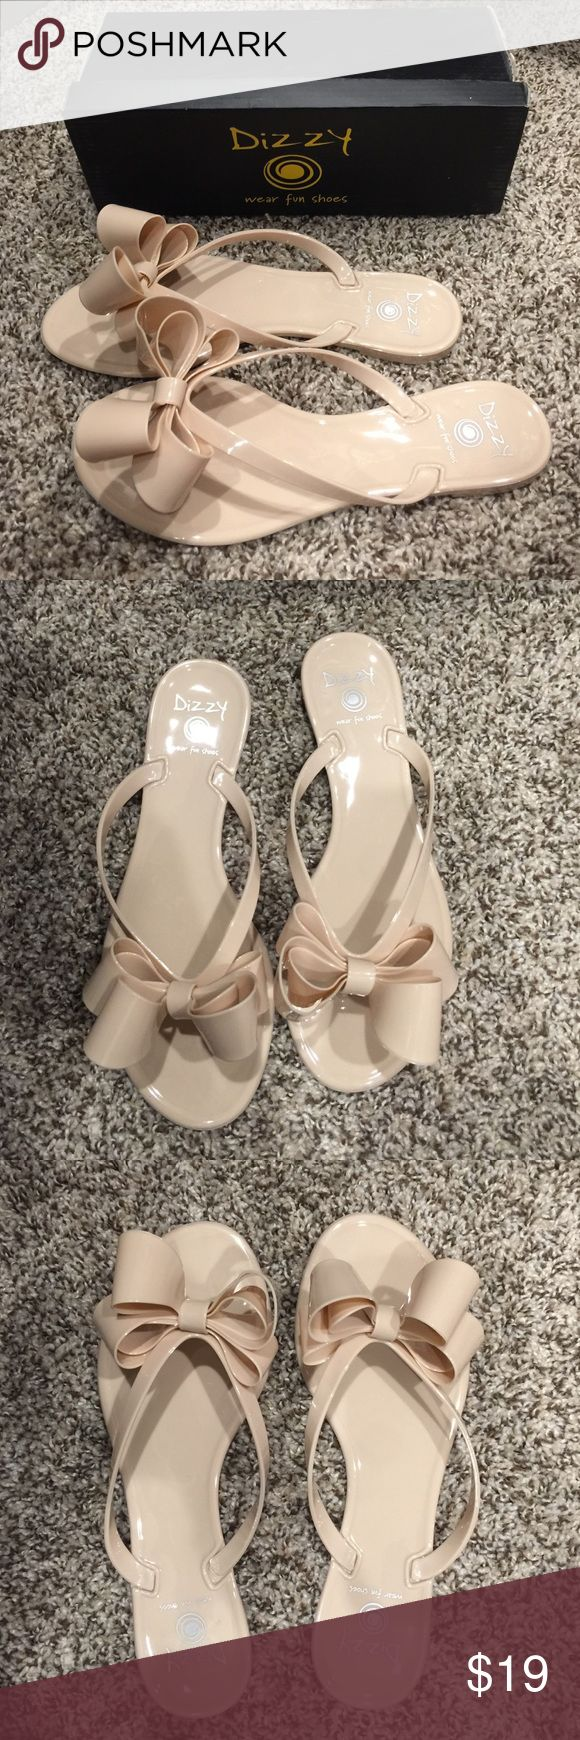 Beige/cream jelly flip flops Brand new in box! dizzy Shoes Sandals